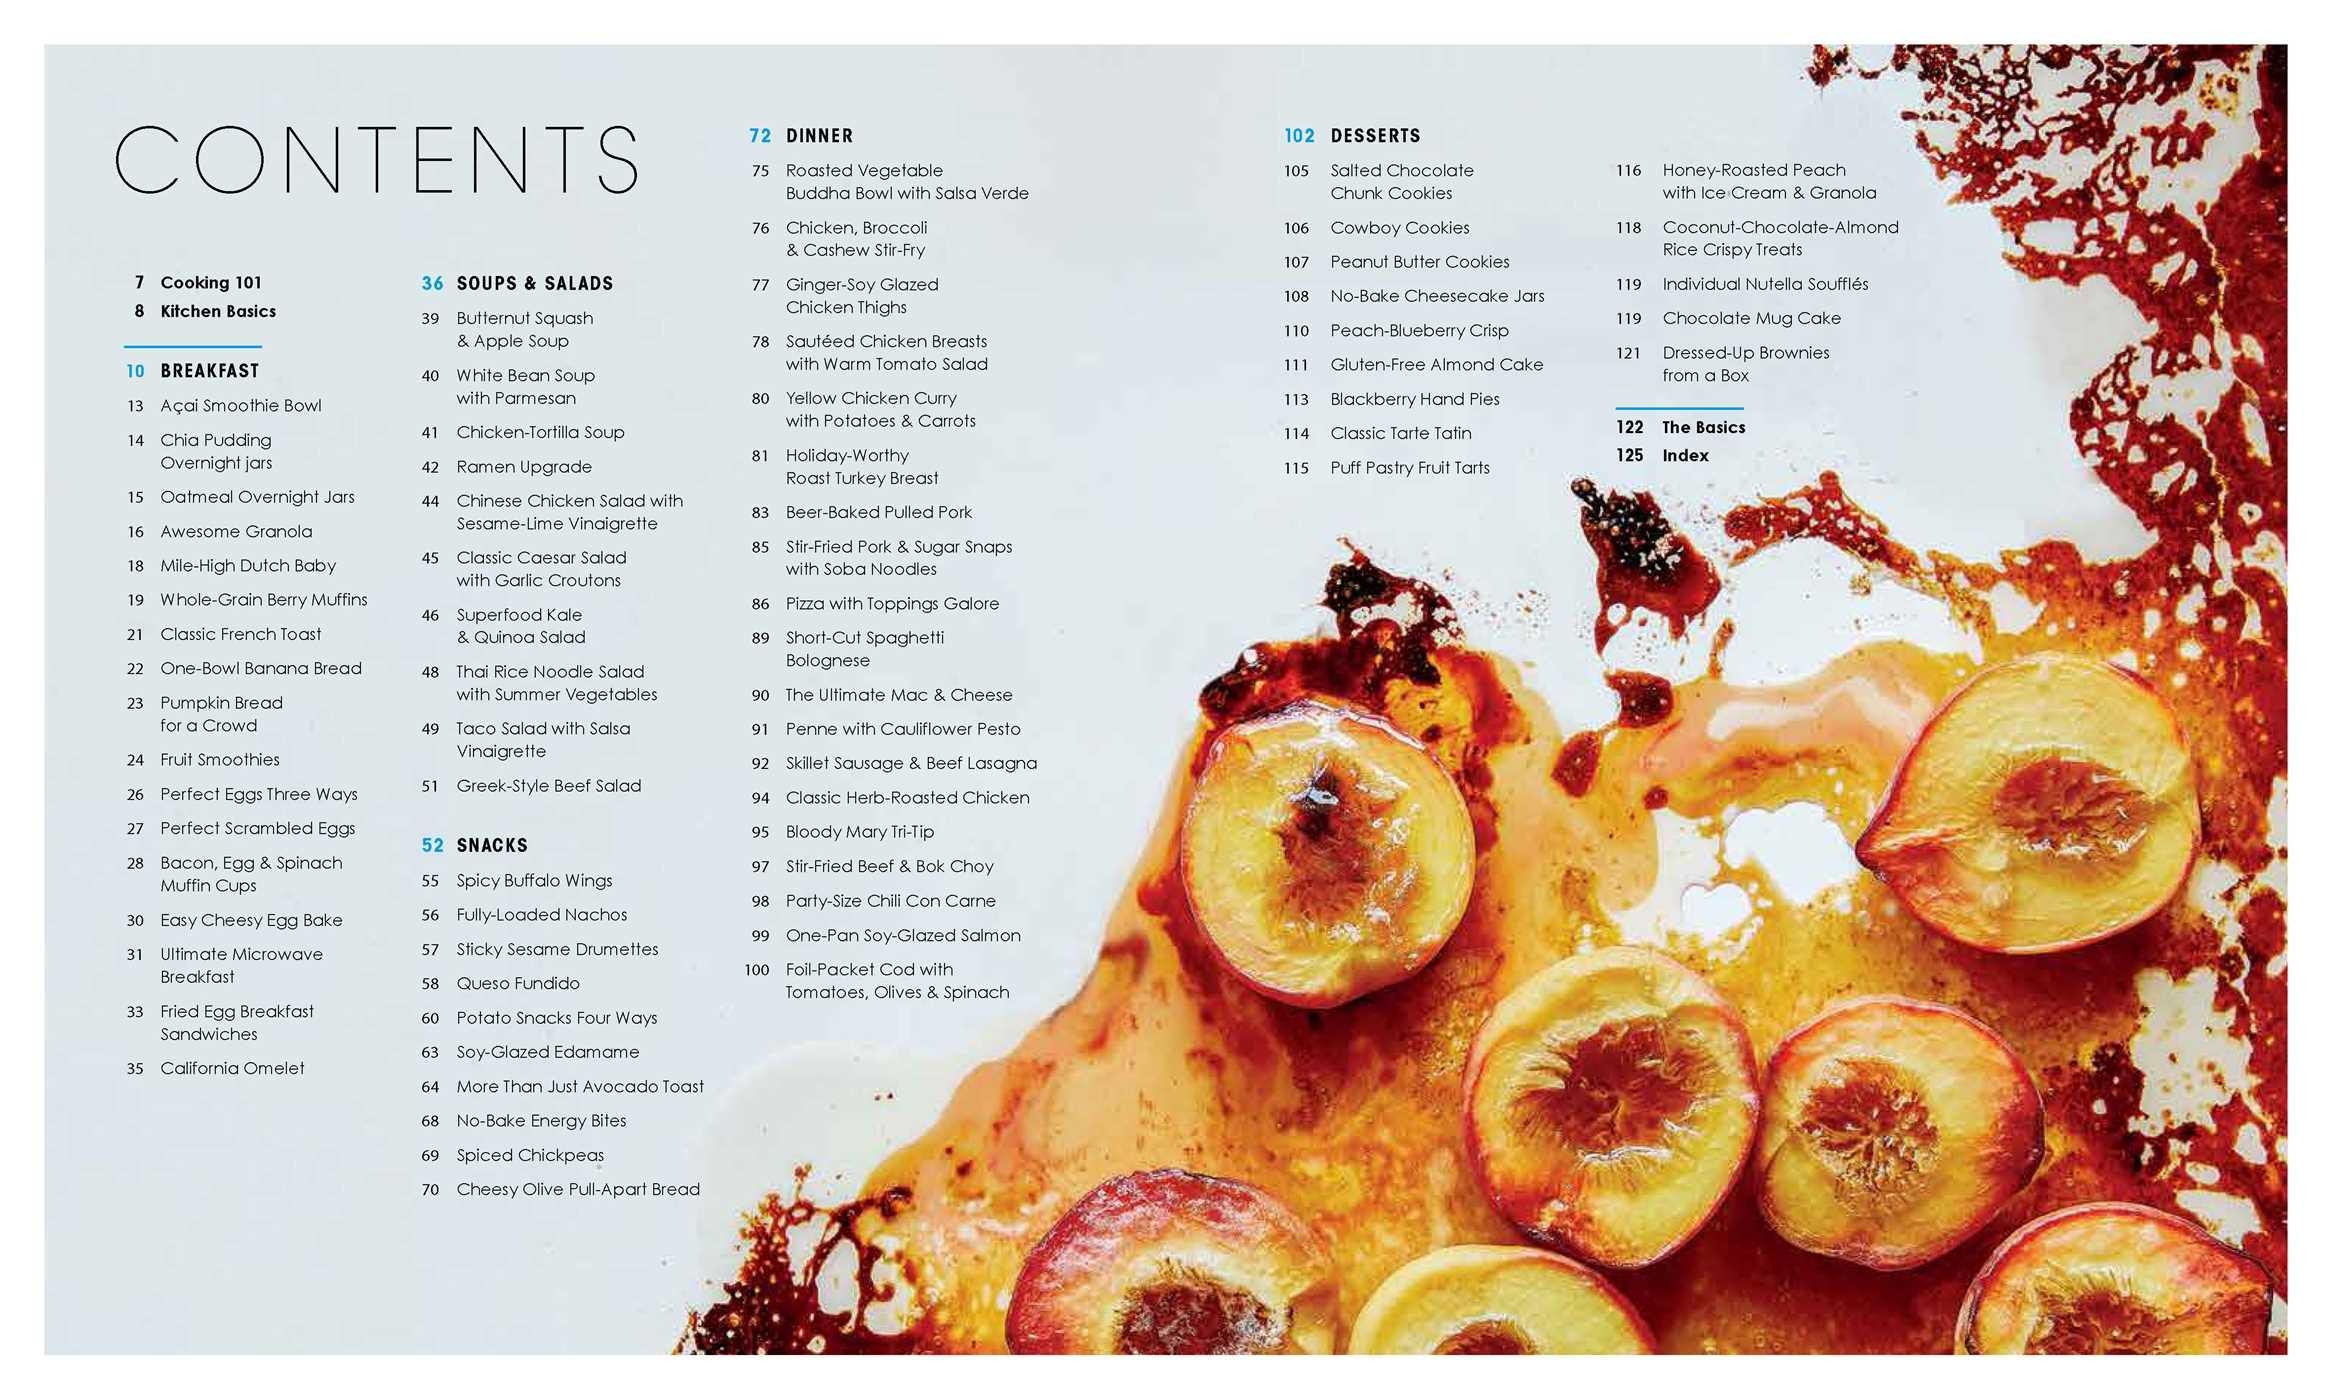 The college cookbook 9781681884363.in01